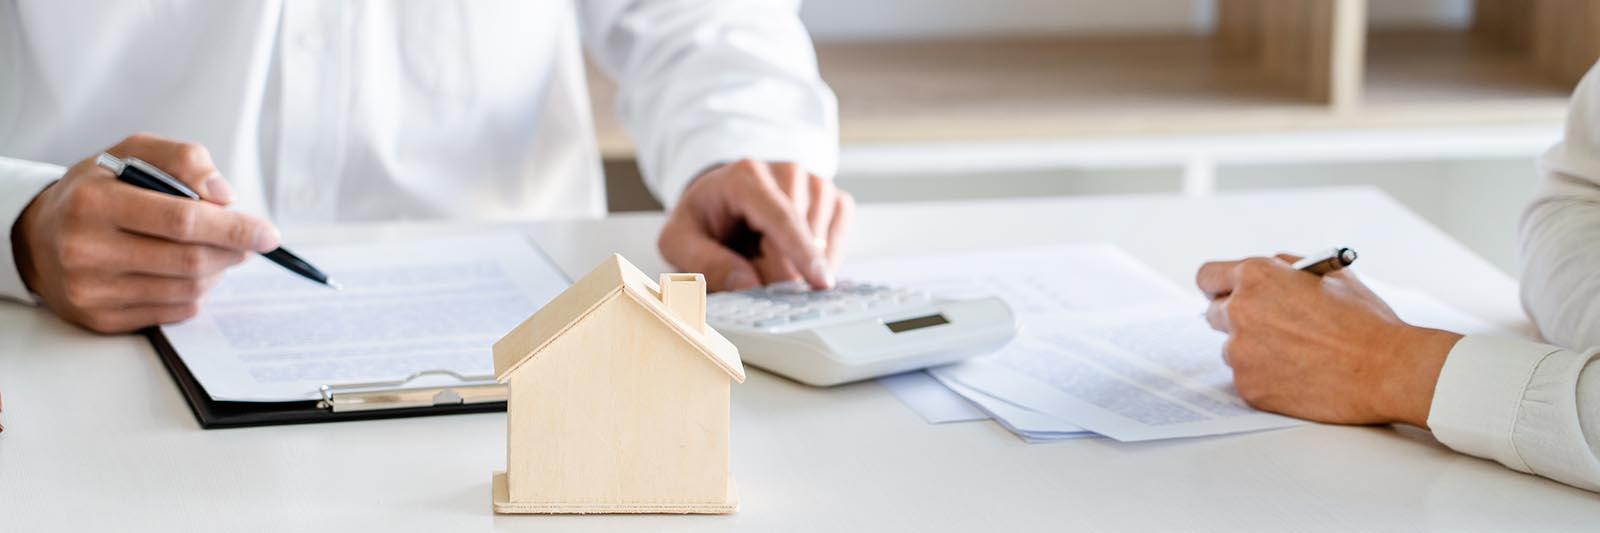 Immobiliengutachten, Immobilienbewertung in Minden